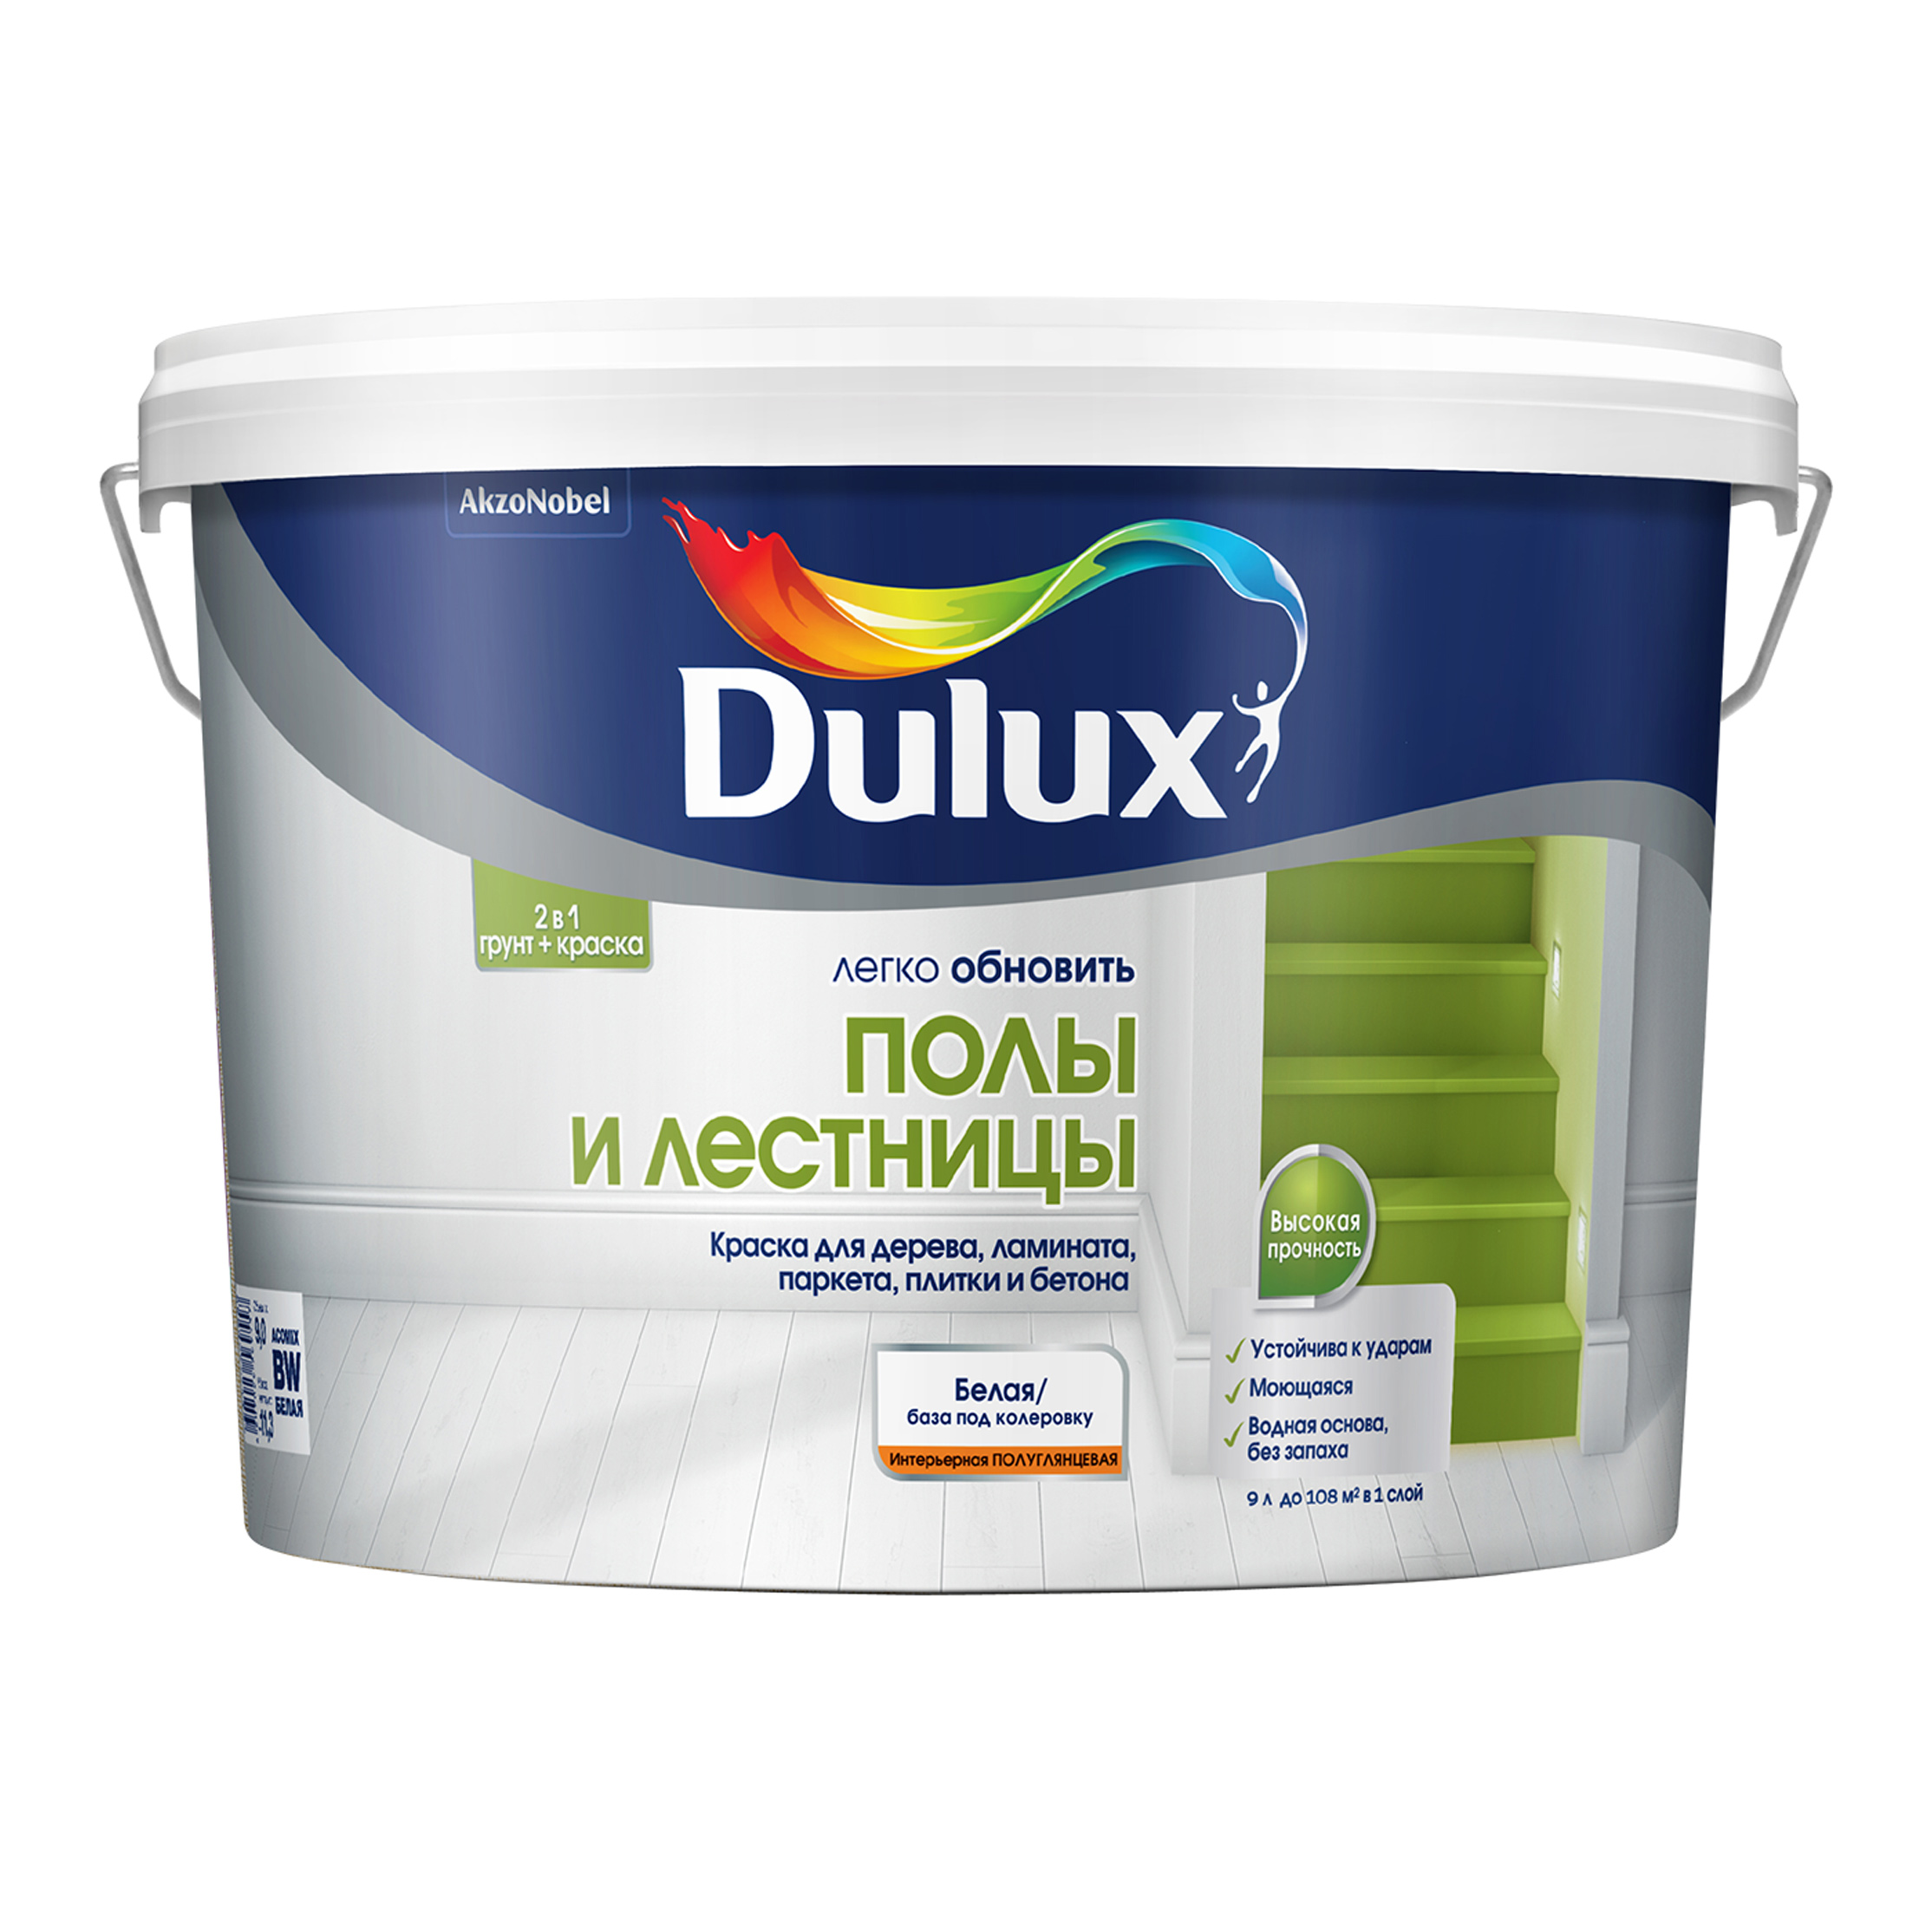 Краска Dulux полы и лестницы 9л bw